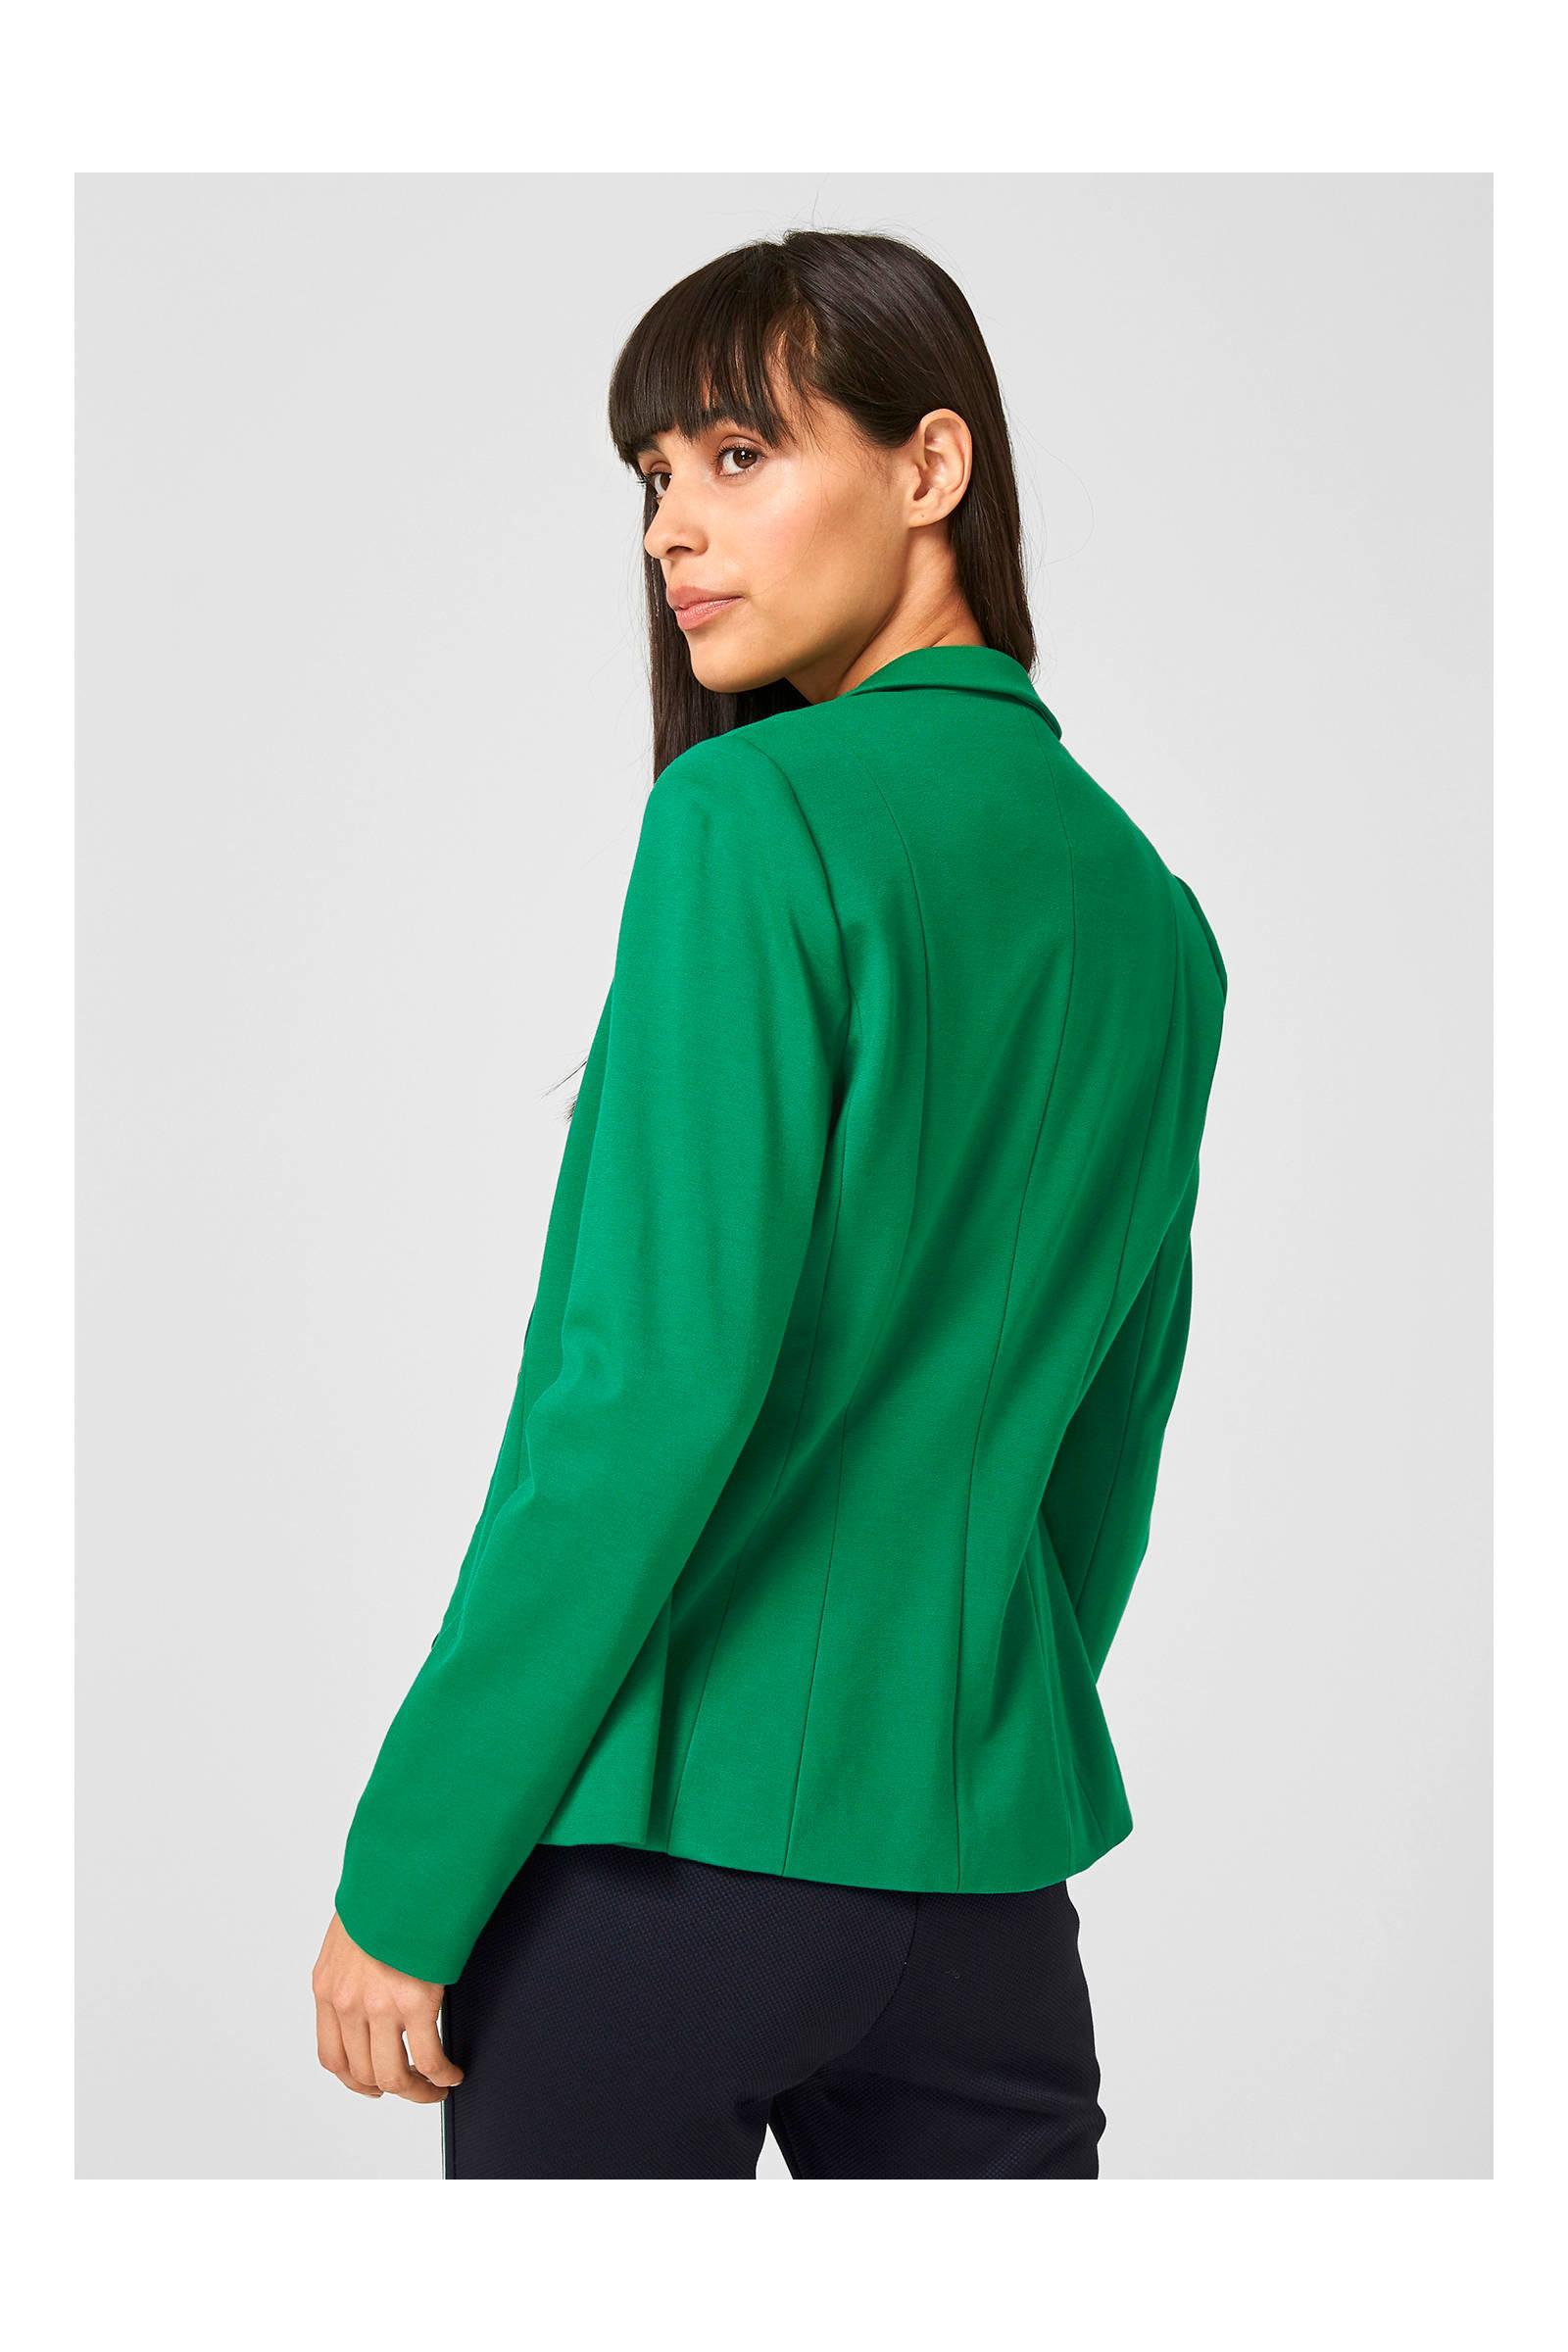 LABEL groen Oliver BLACK s sweatblazer xCvYwSnvpq